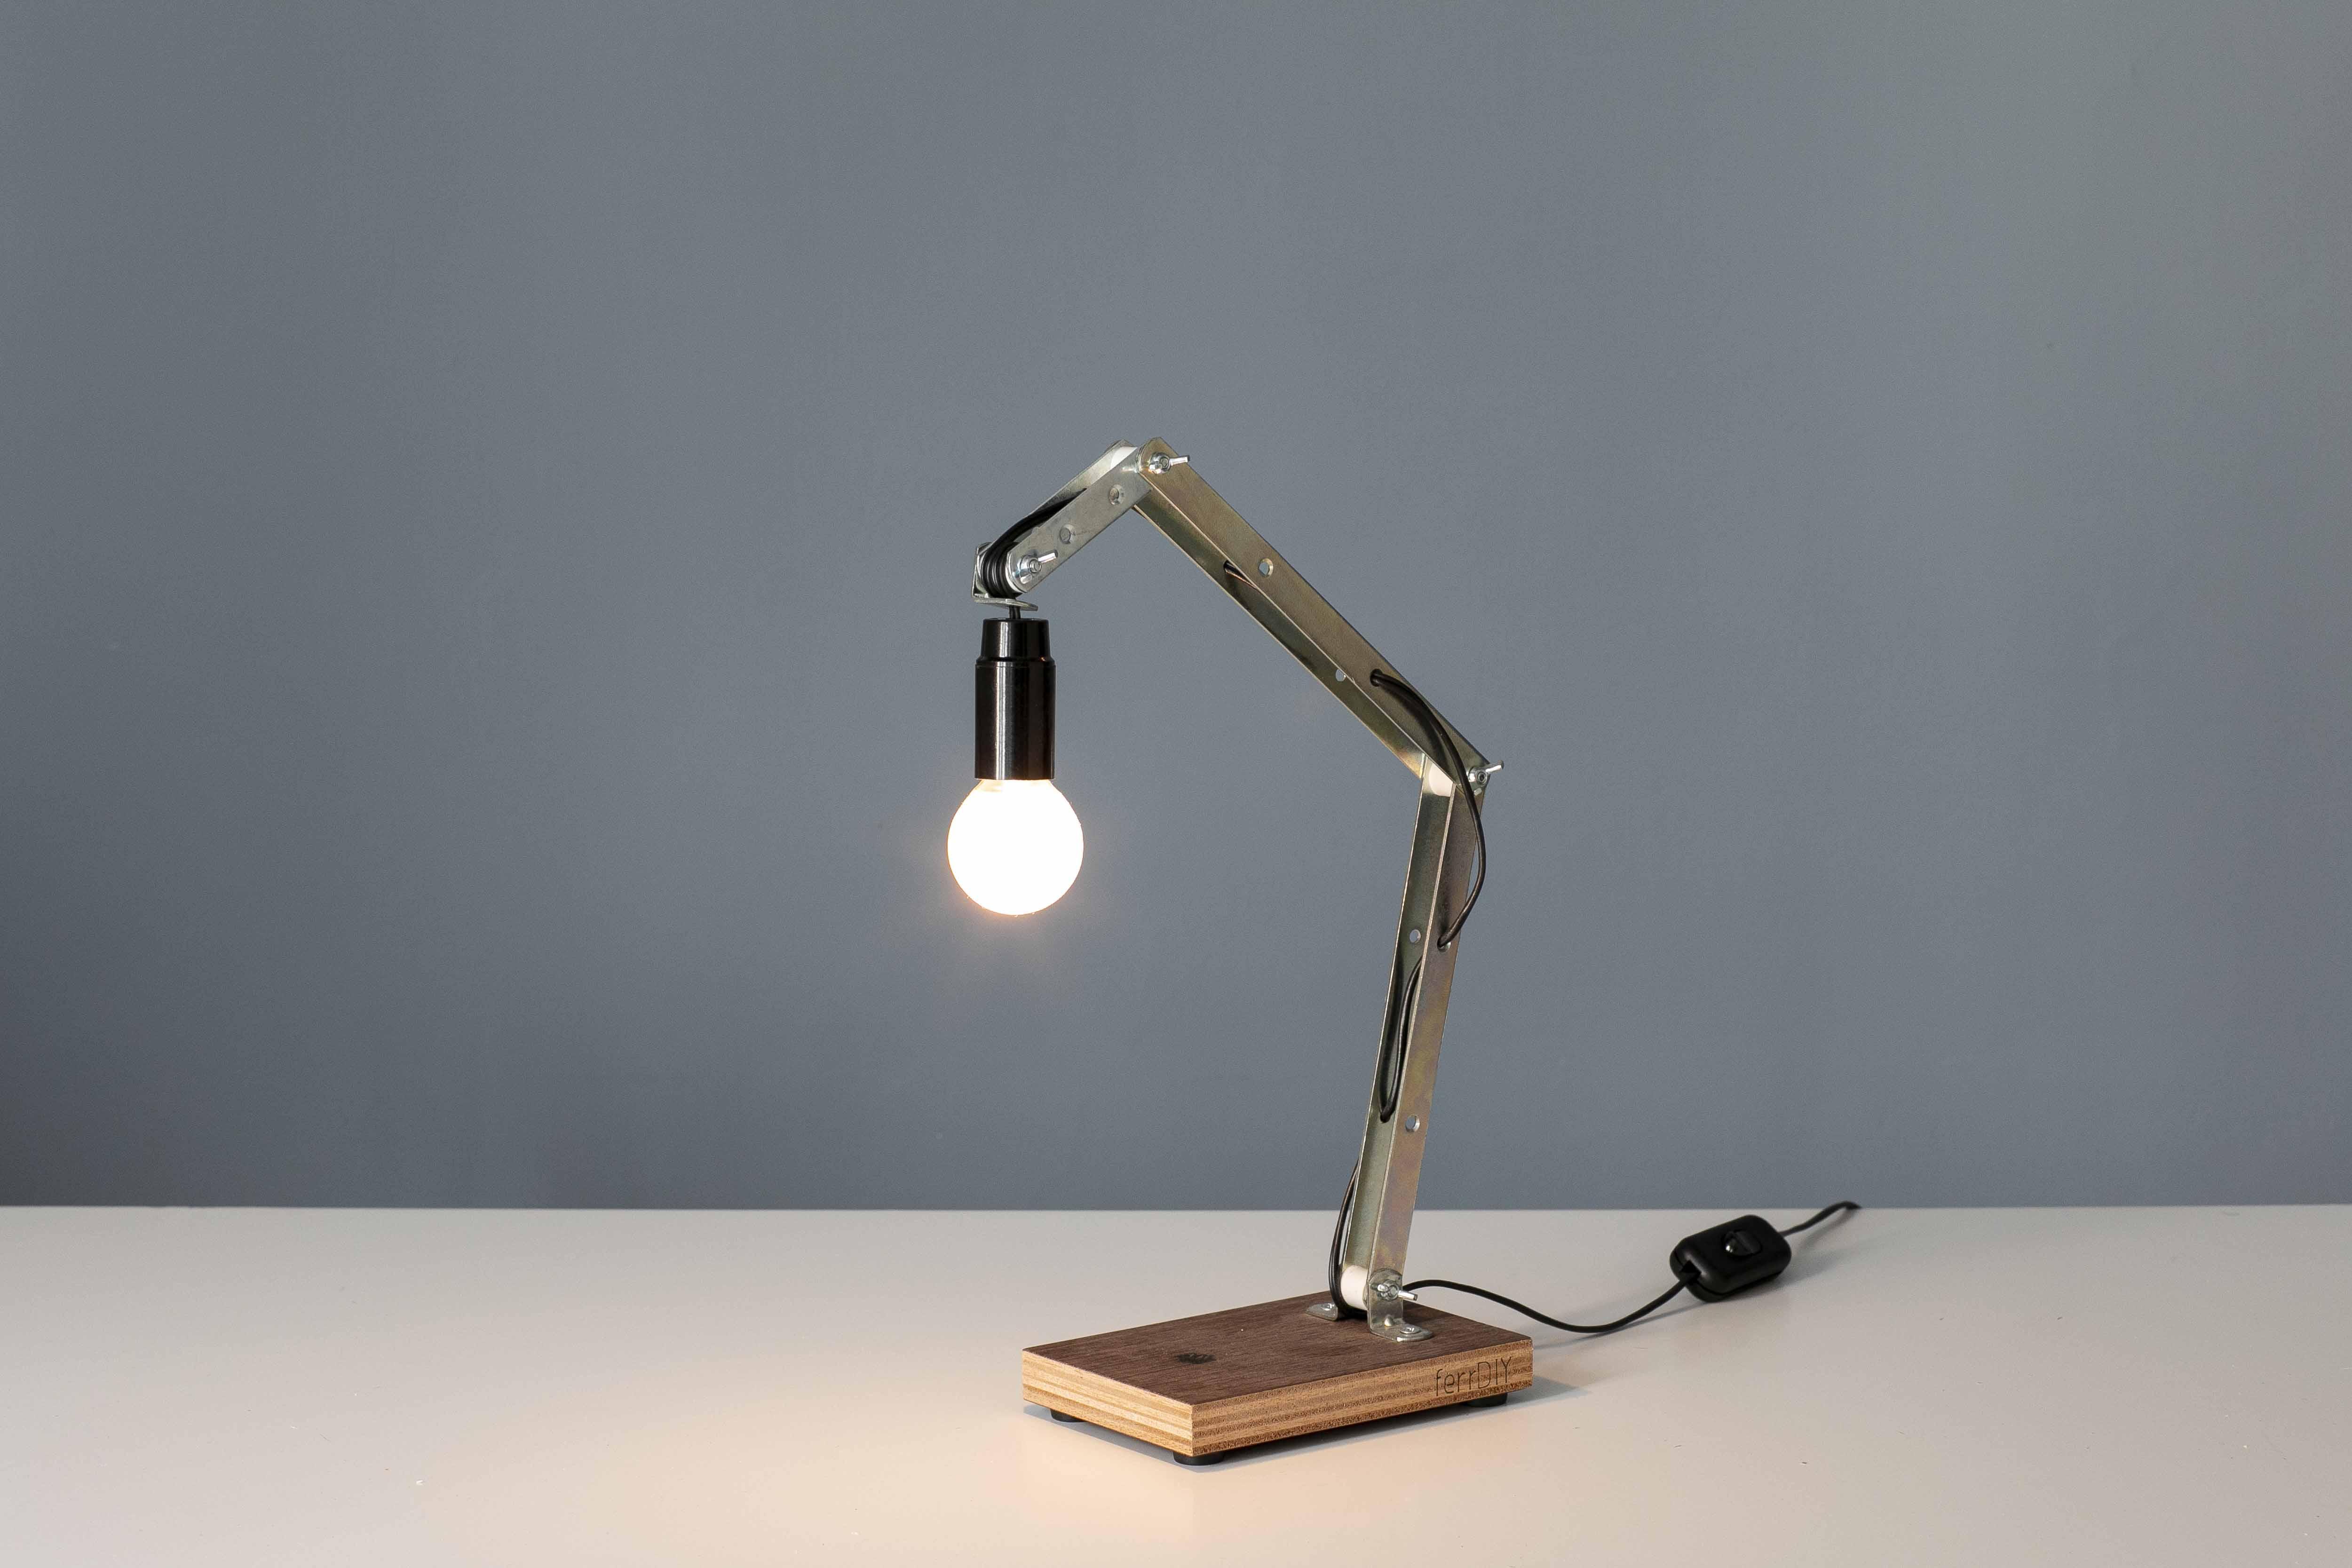 Feerdiy | Linea lampade DIY